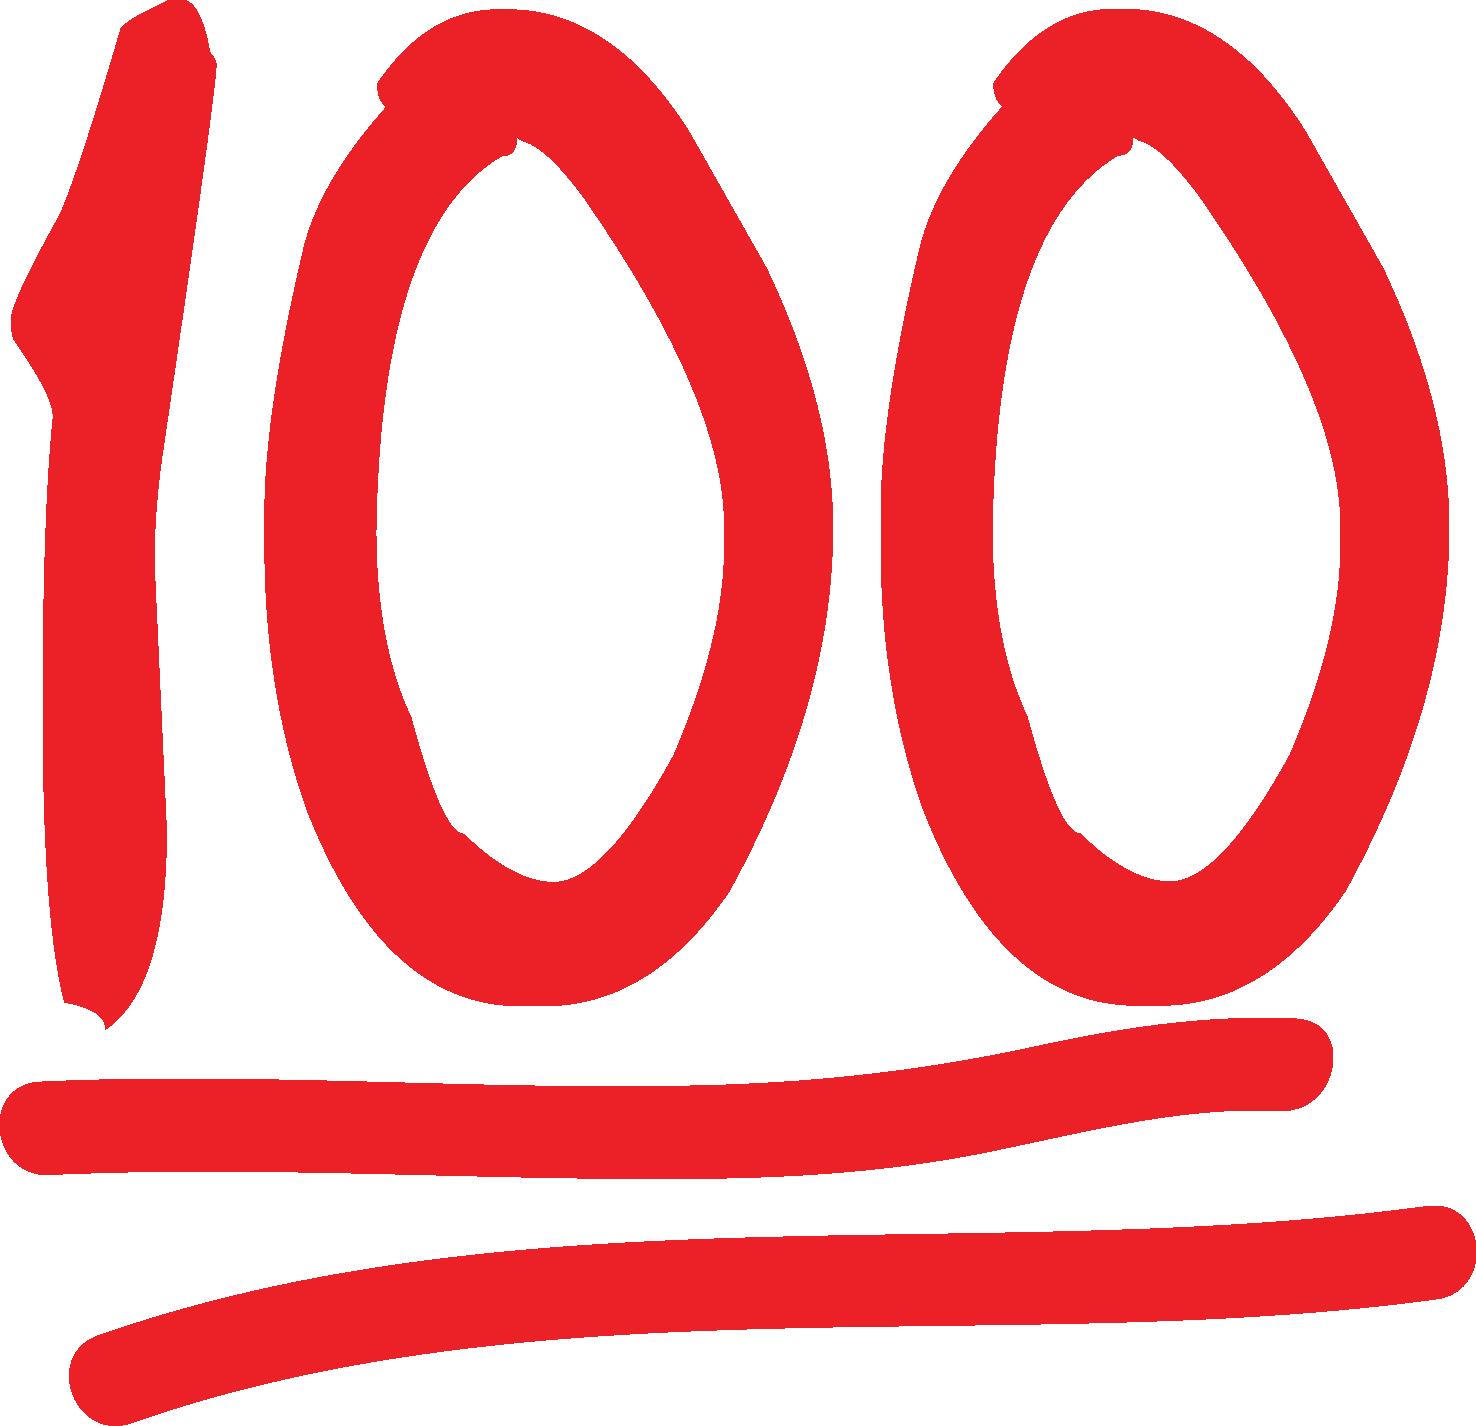 Hundred Points Symbol Emoji - Emojipedia